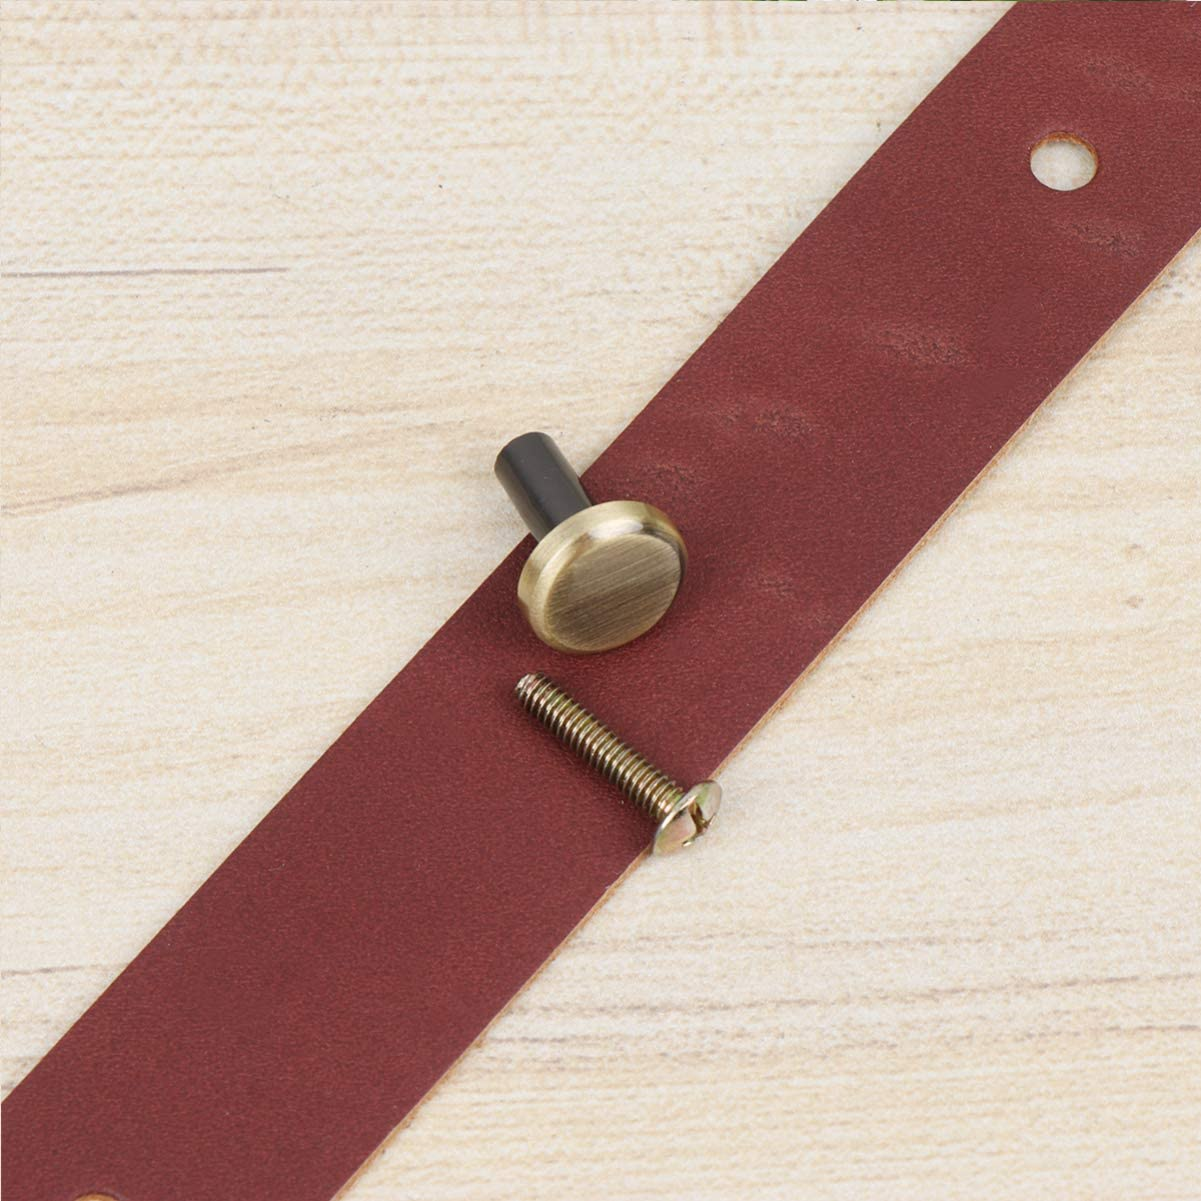 Dark Brown Healifty 2PCS Leather Handle Vintage Handle Pulls Handle Strap Replacement for Furniture Drawer Door Cabinet Wardrobe